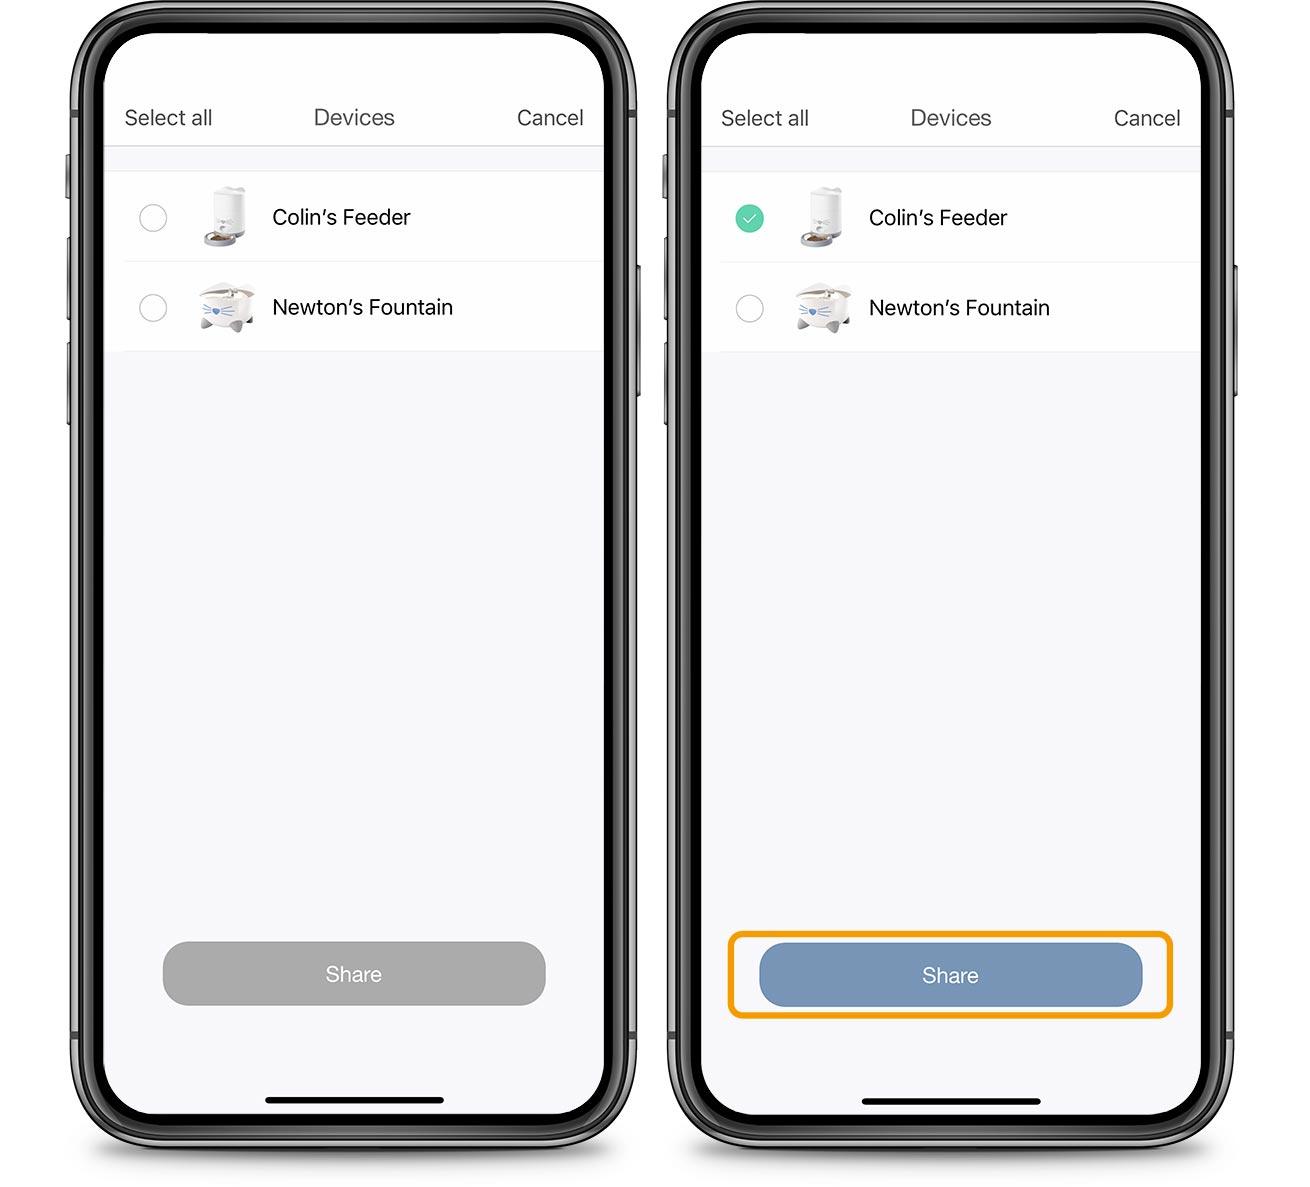 PIXI App Account Share Device